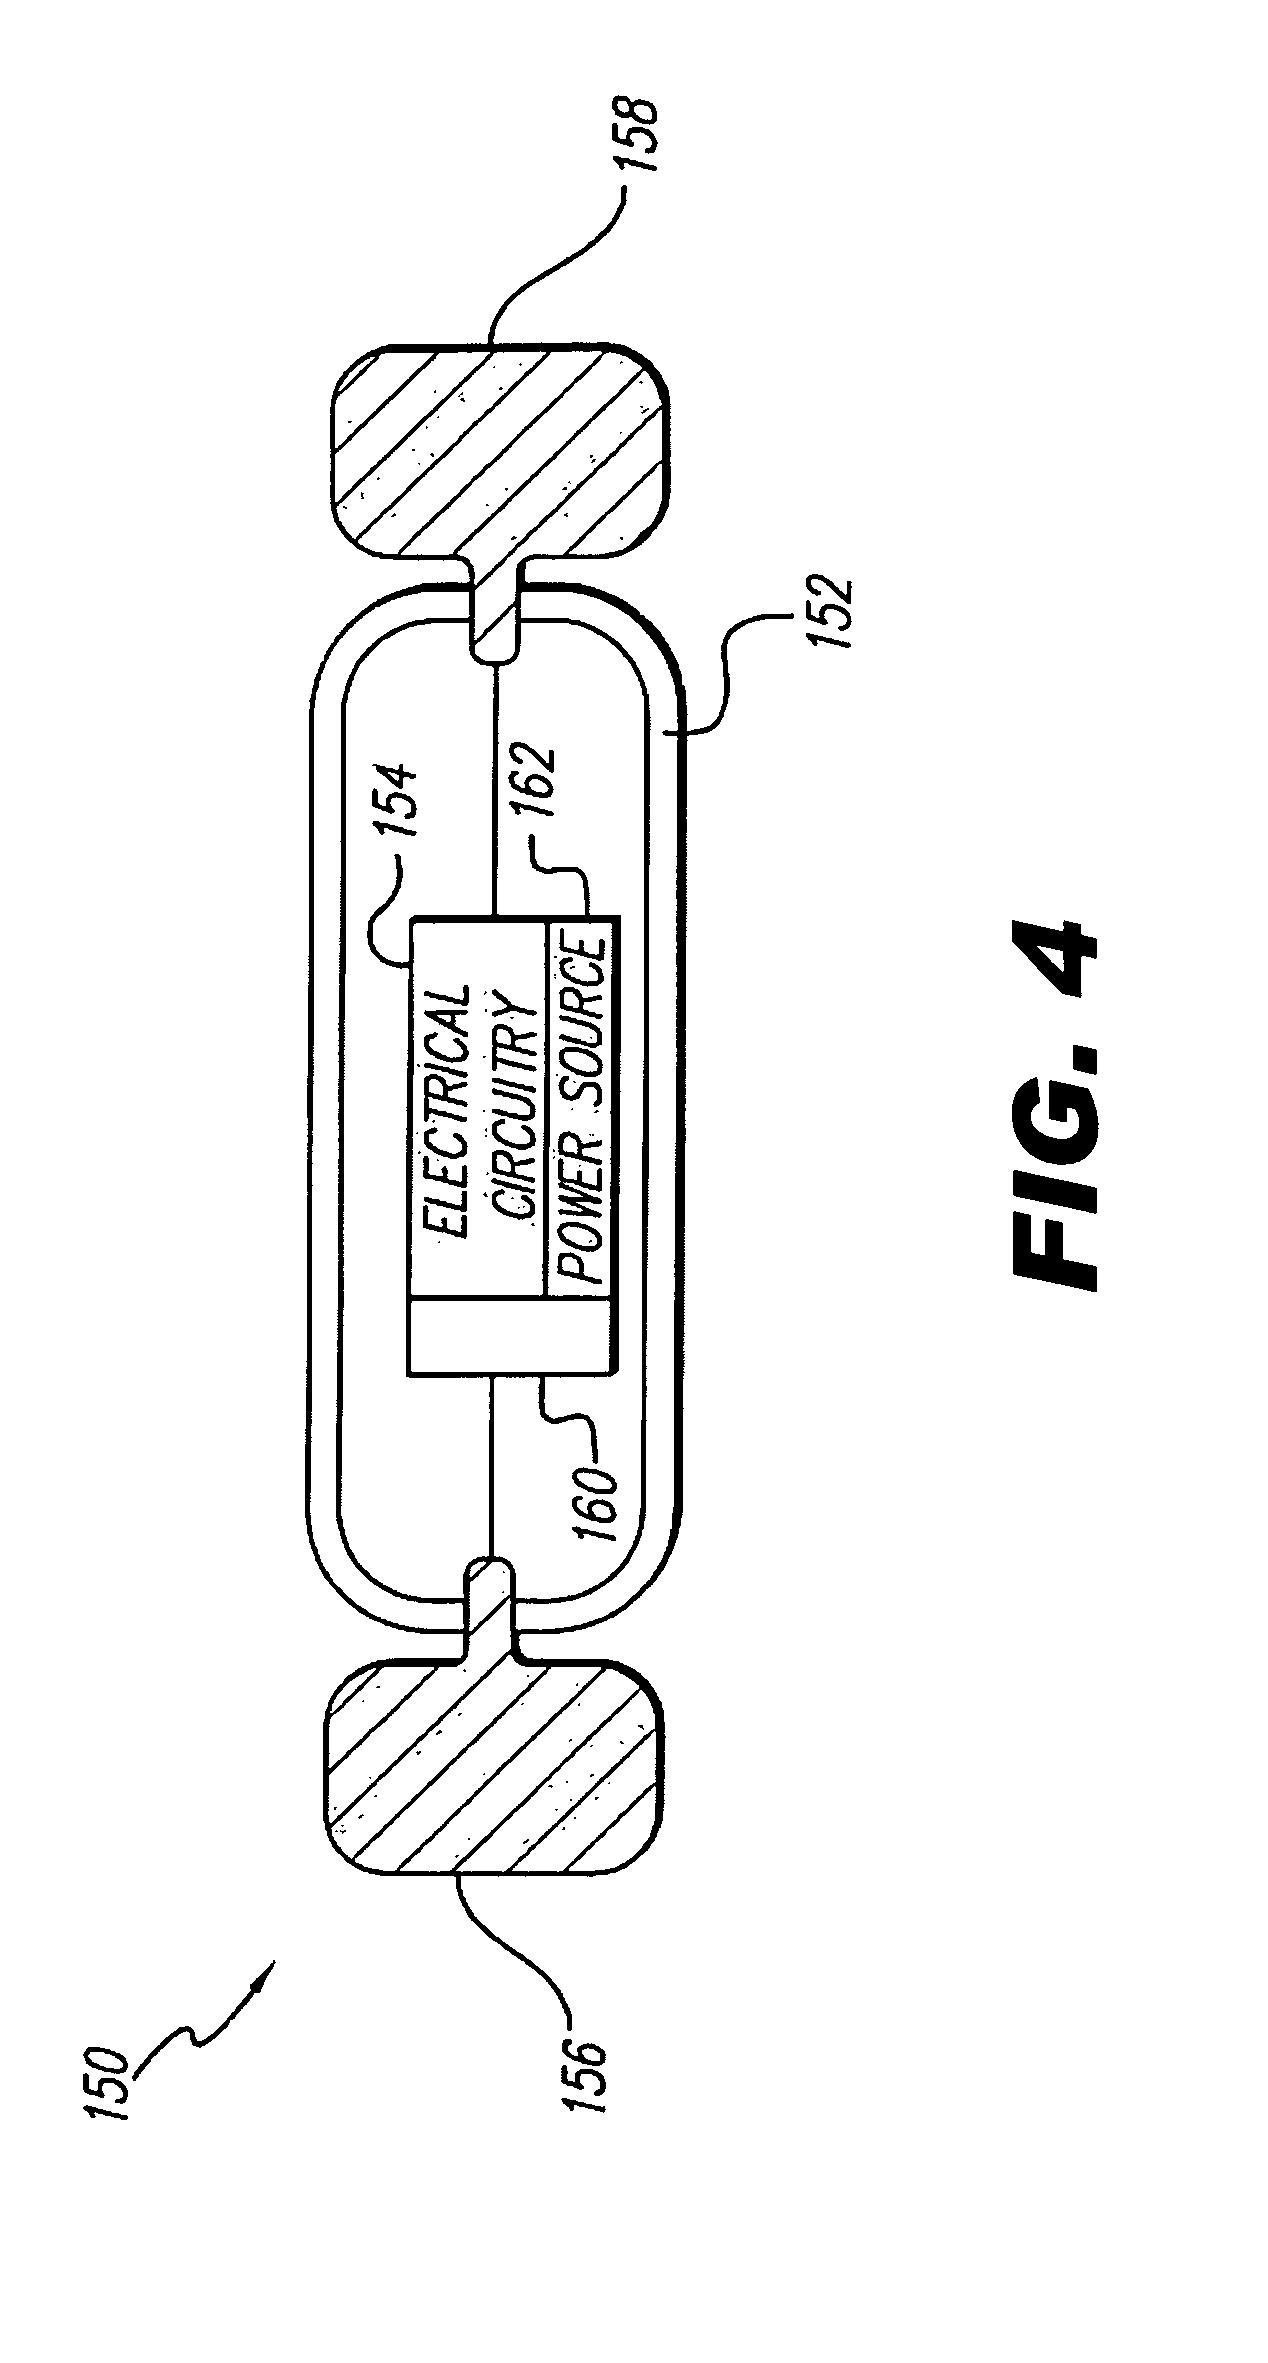 Patent Us8214048 Fully Implantable Neurostimulator For